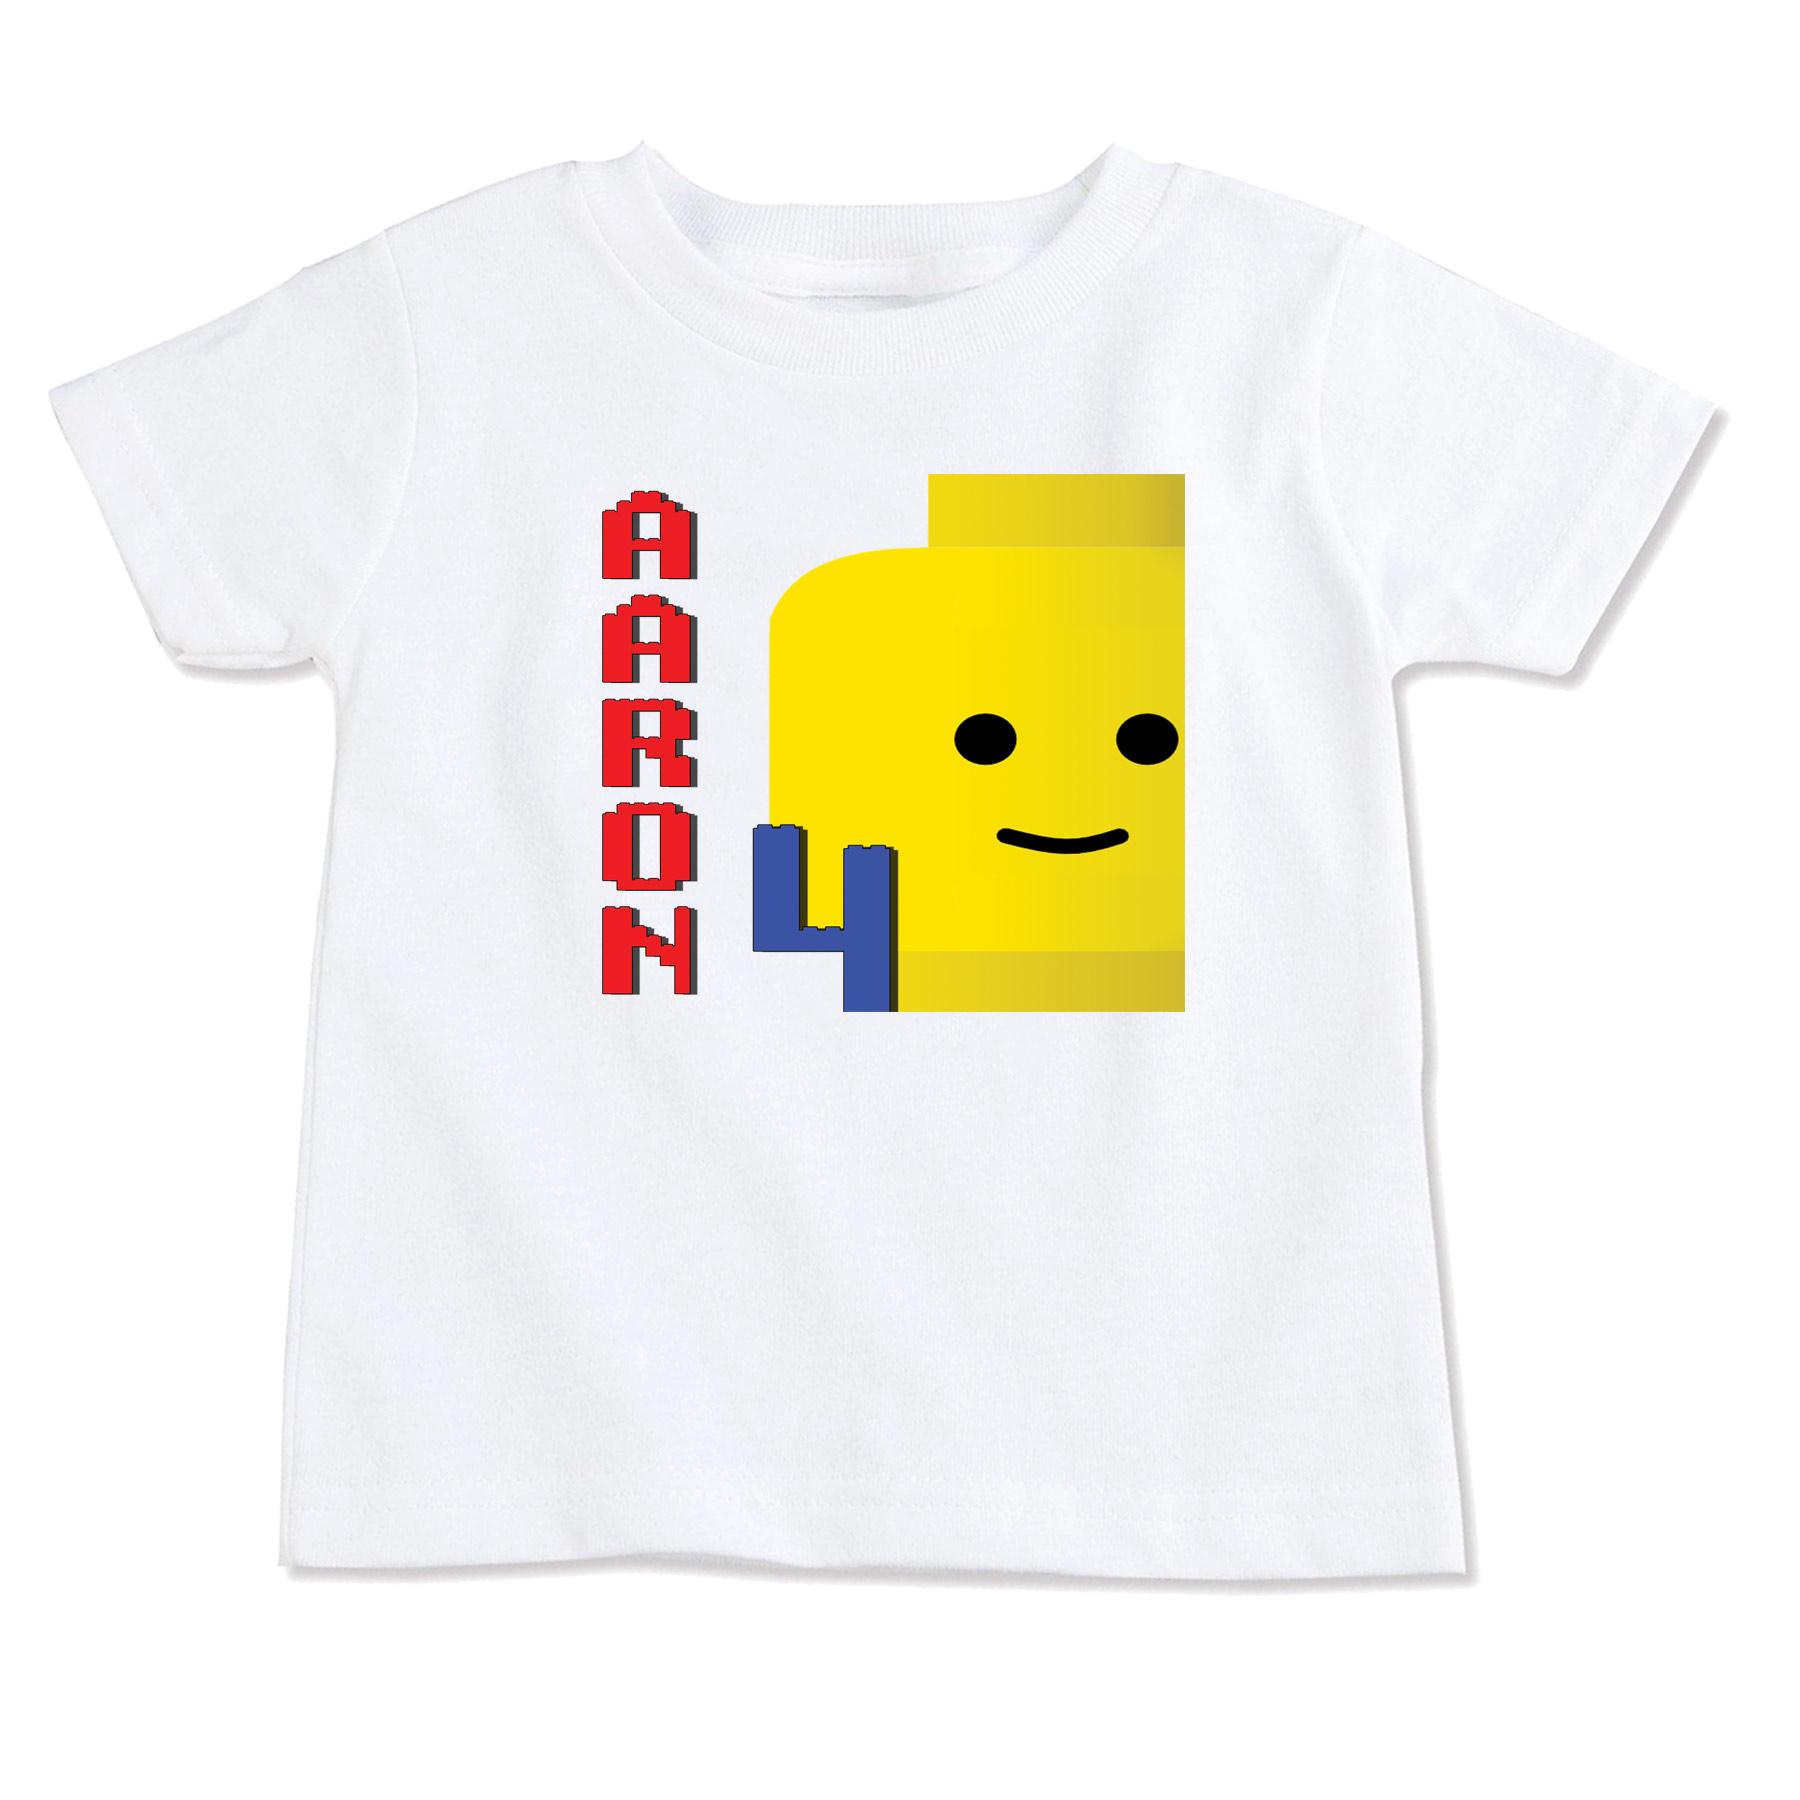 Lego T Shirtbirthday T Shirtparty T Shirtpersonalized T Shirt